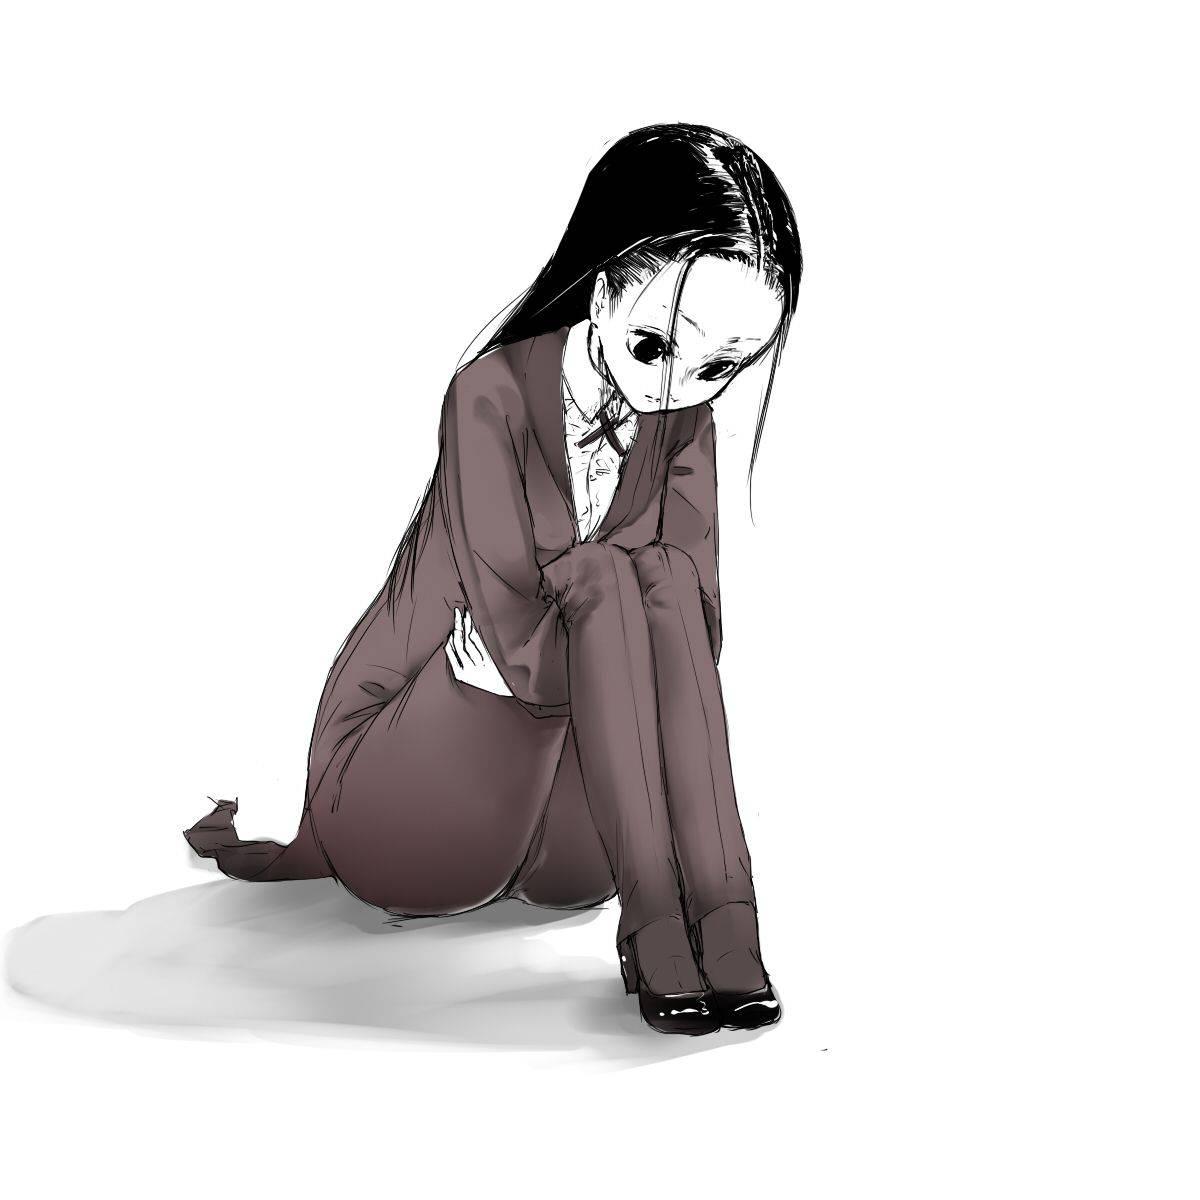 【HUNTER×HUNTER】アマネのエロ画像【ハンターハンター】【11】